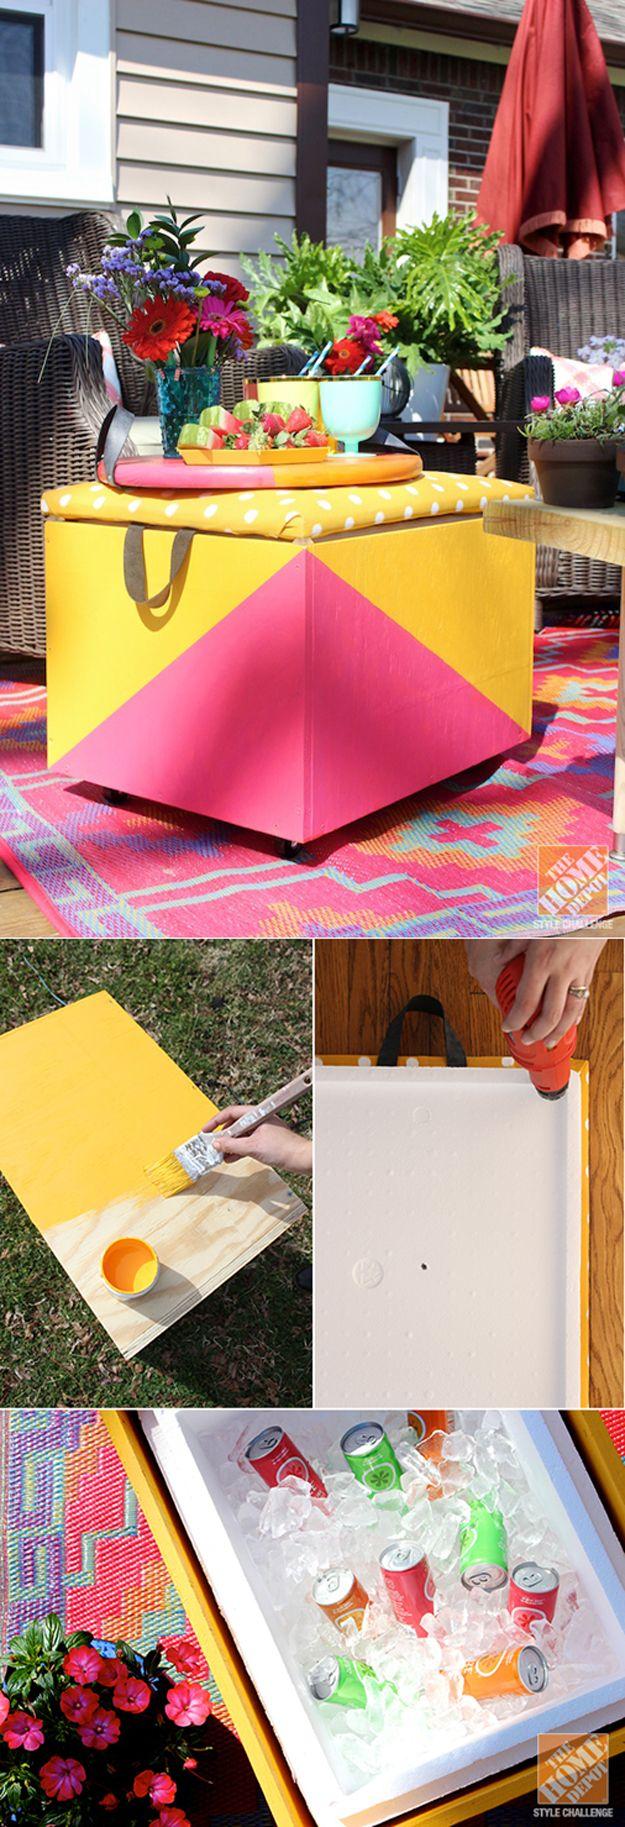 Bricolaje Backyard Tutoriales de muebles | artesaniasdebricolaje.ru/diy-projects-backyard-furniture/